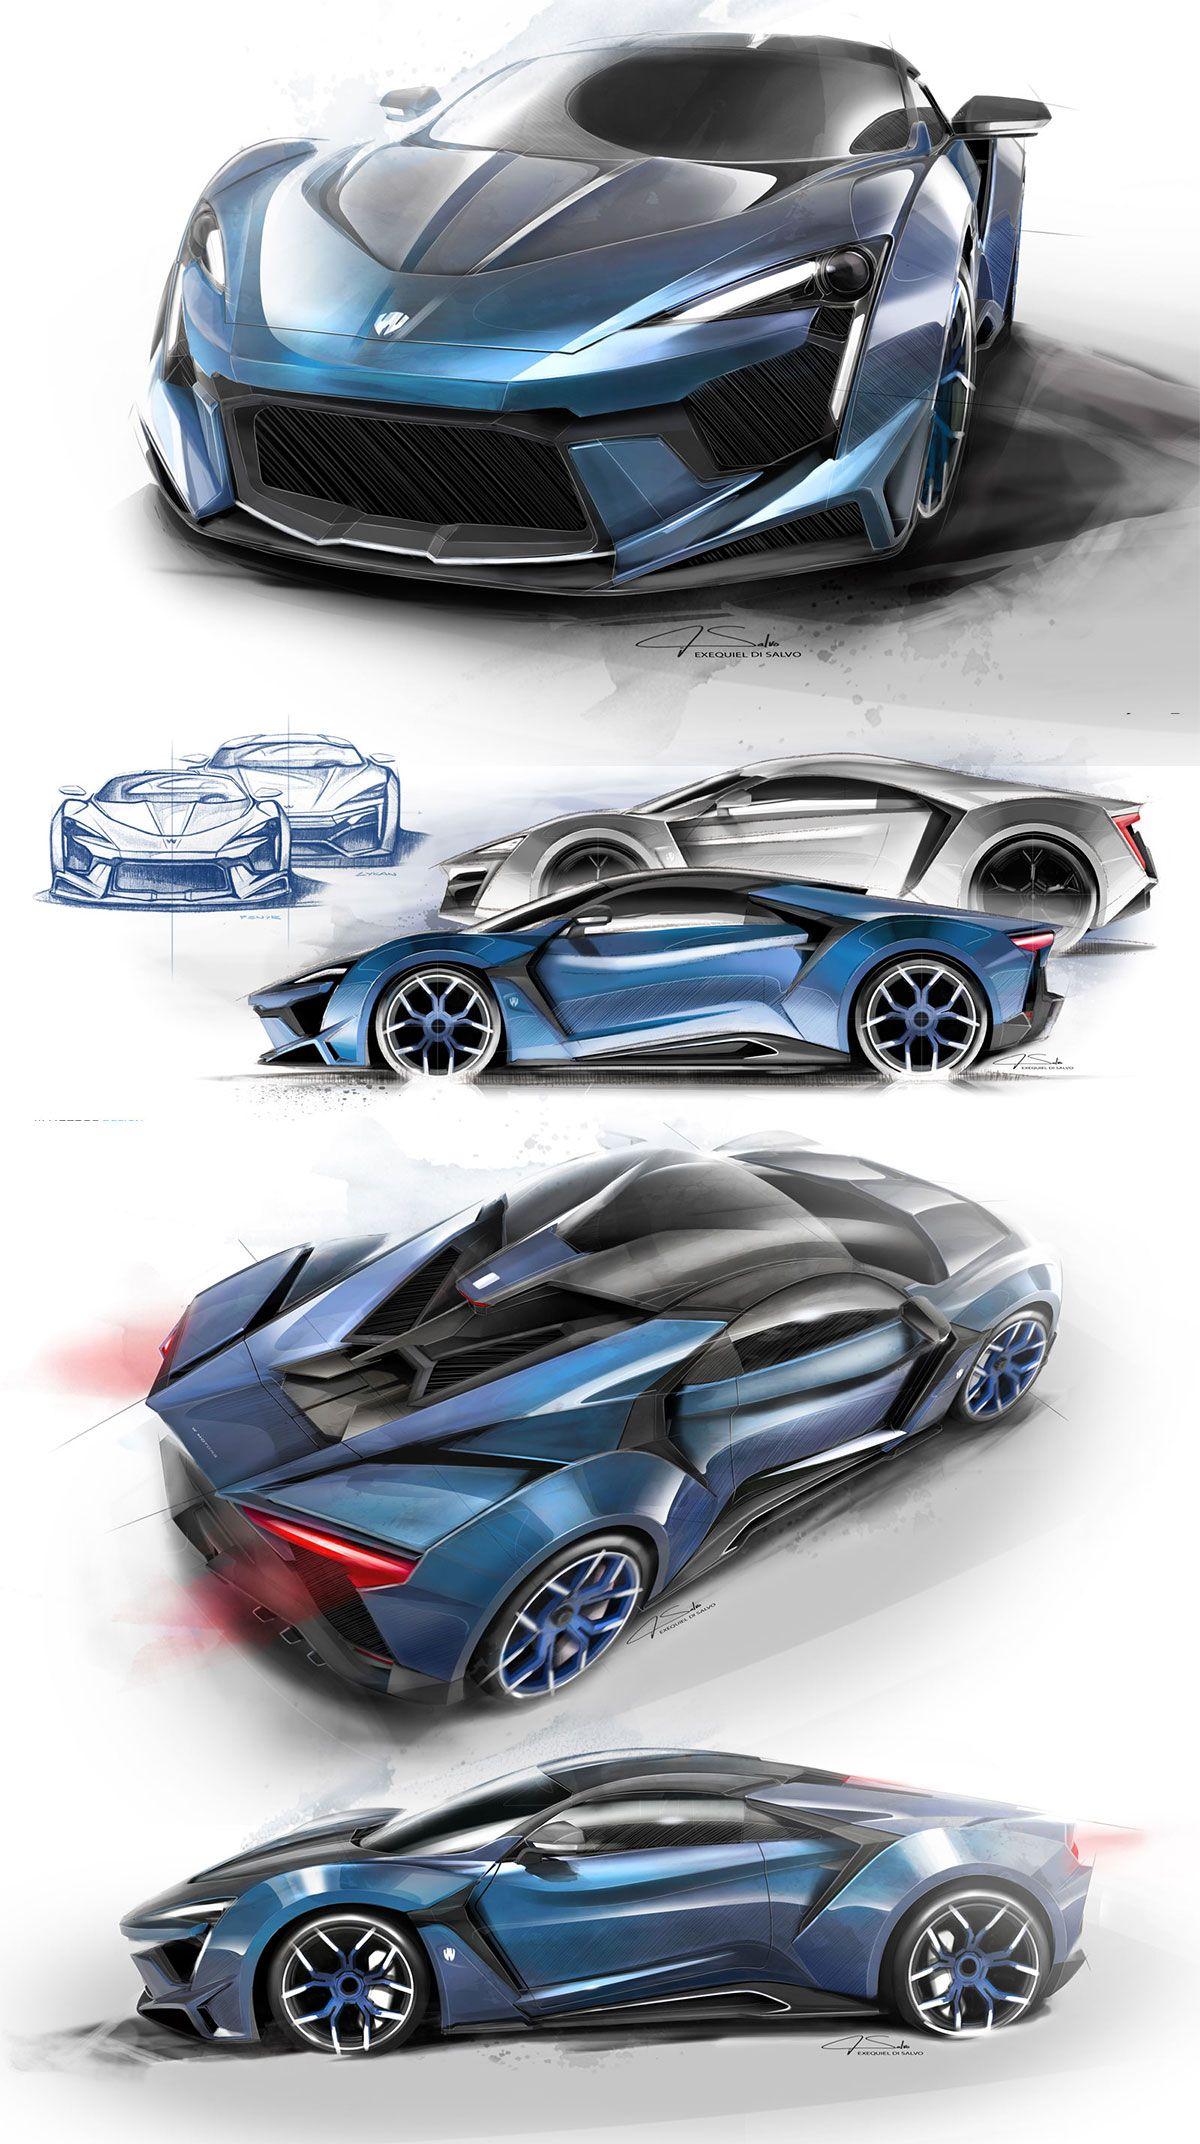 W Motors Fenyr Supersport Designs Sketches Concept Car Design Concept Car Sketch Futuristic Cars